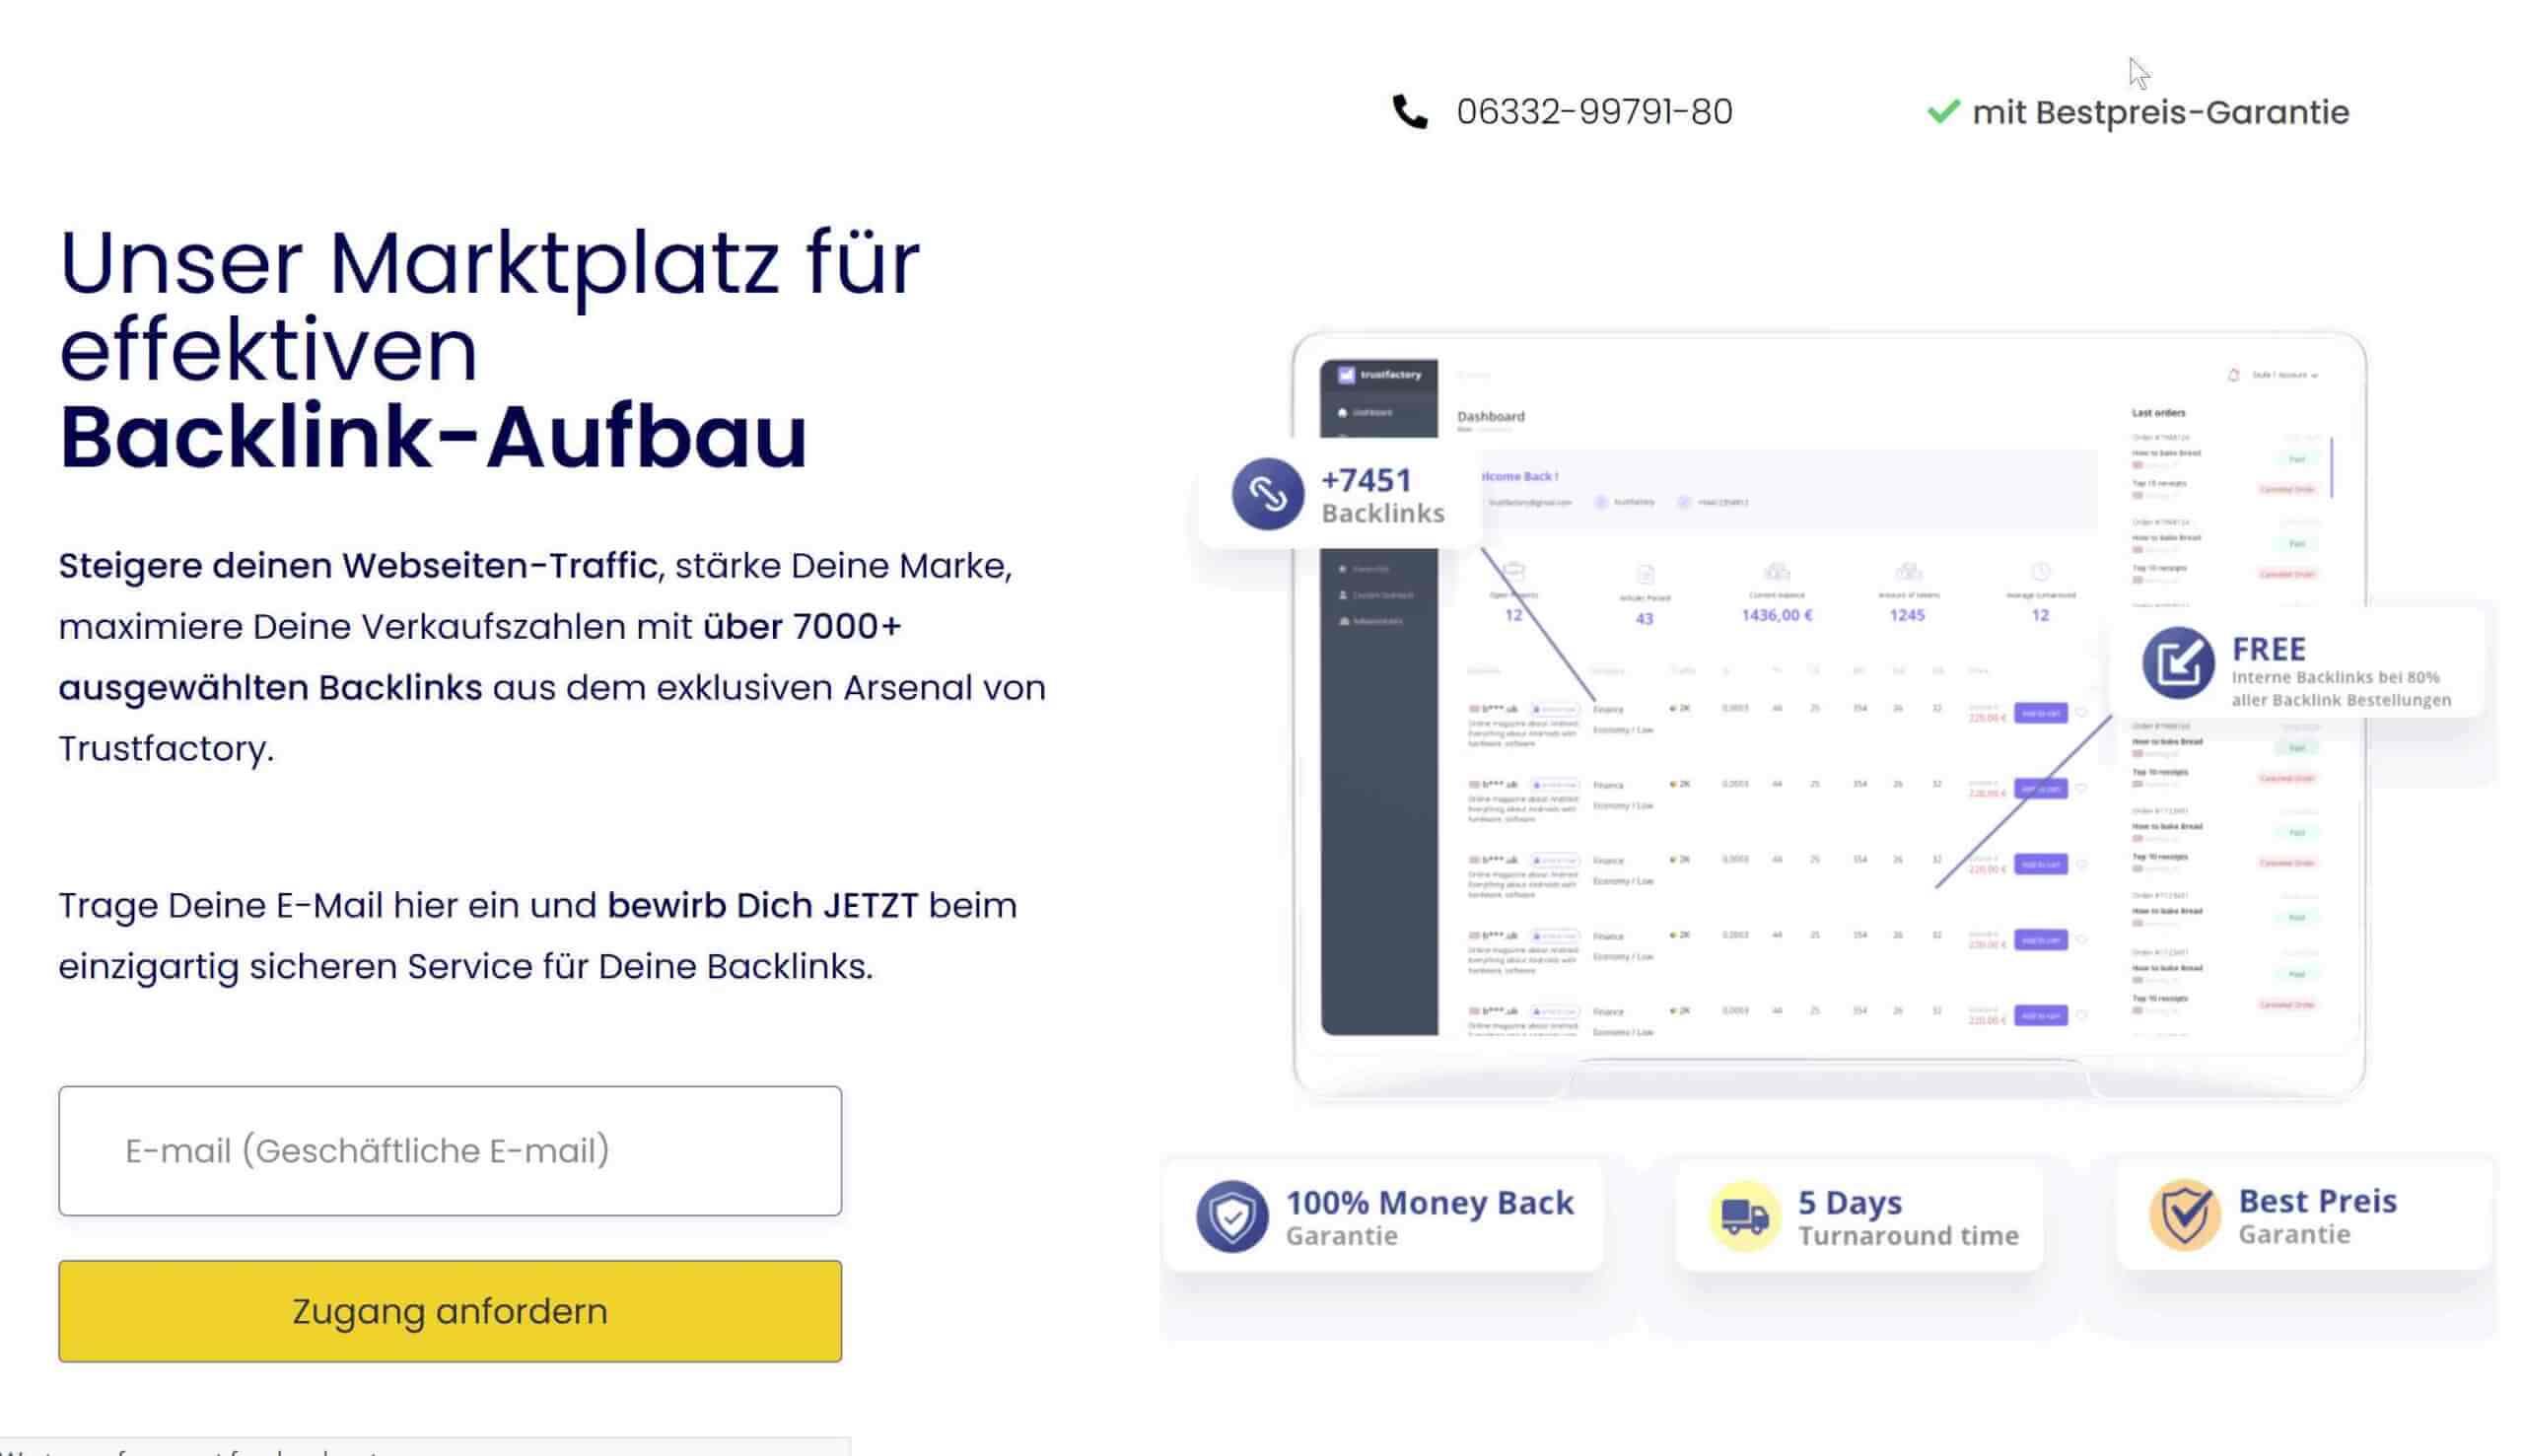 TrustFactory als Alternative fuer Backlinked